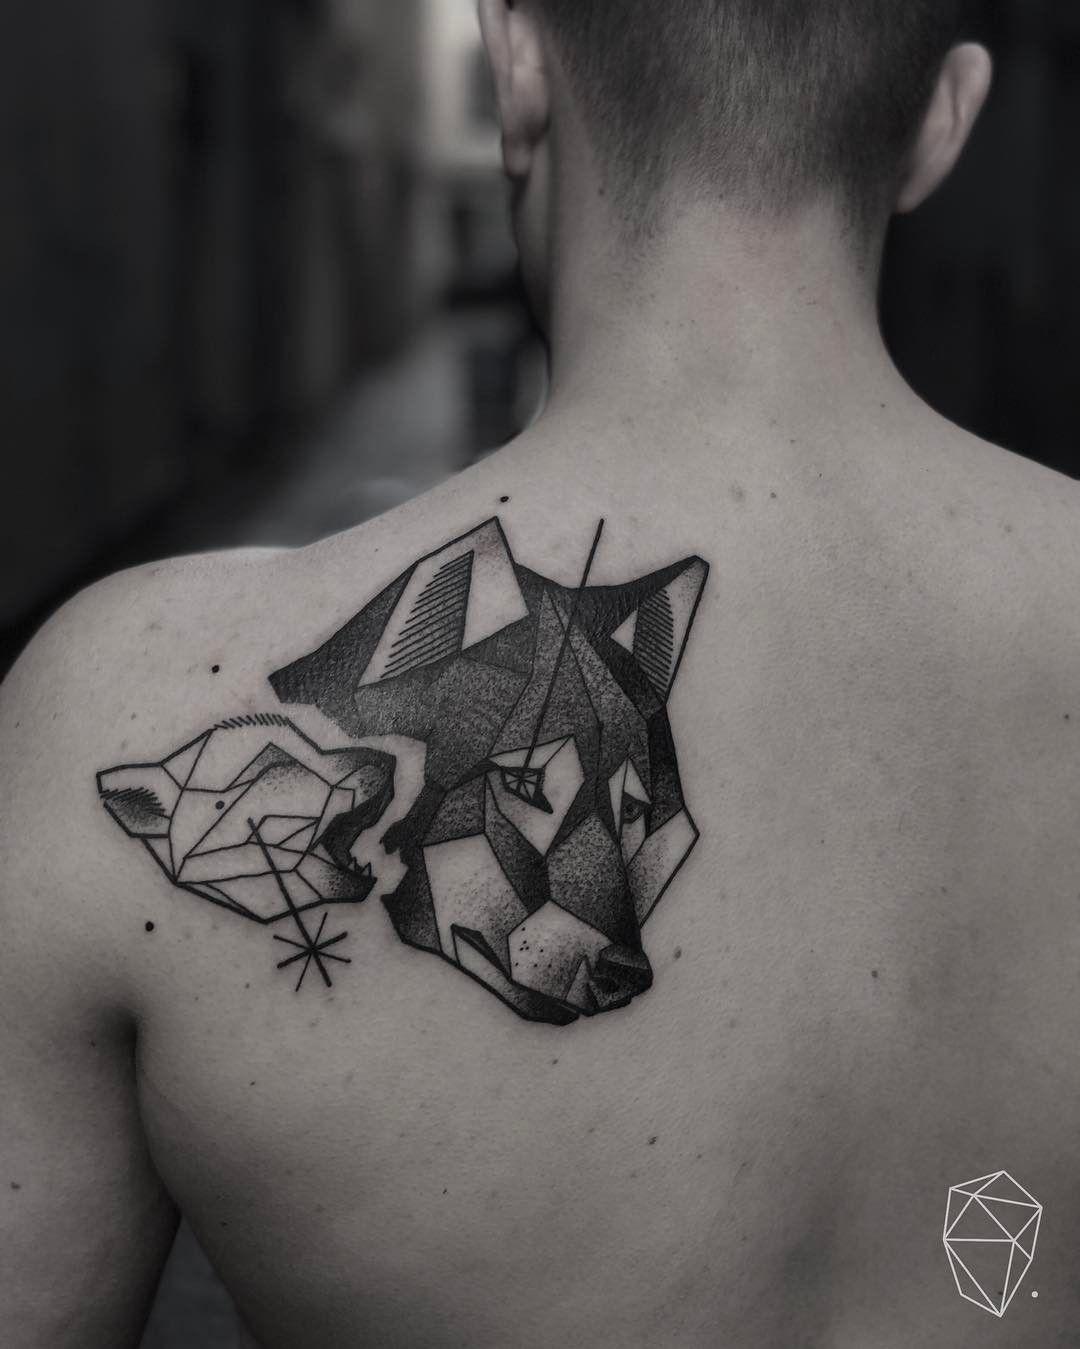 Resident Artist Fecanes Dublin Ink Tattoo Art Ireland